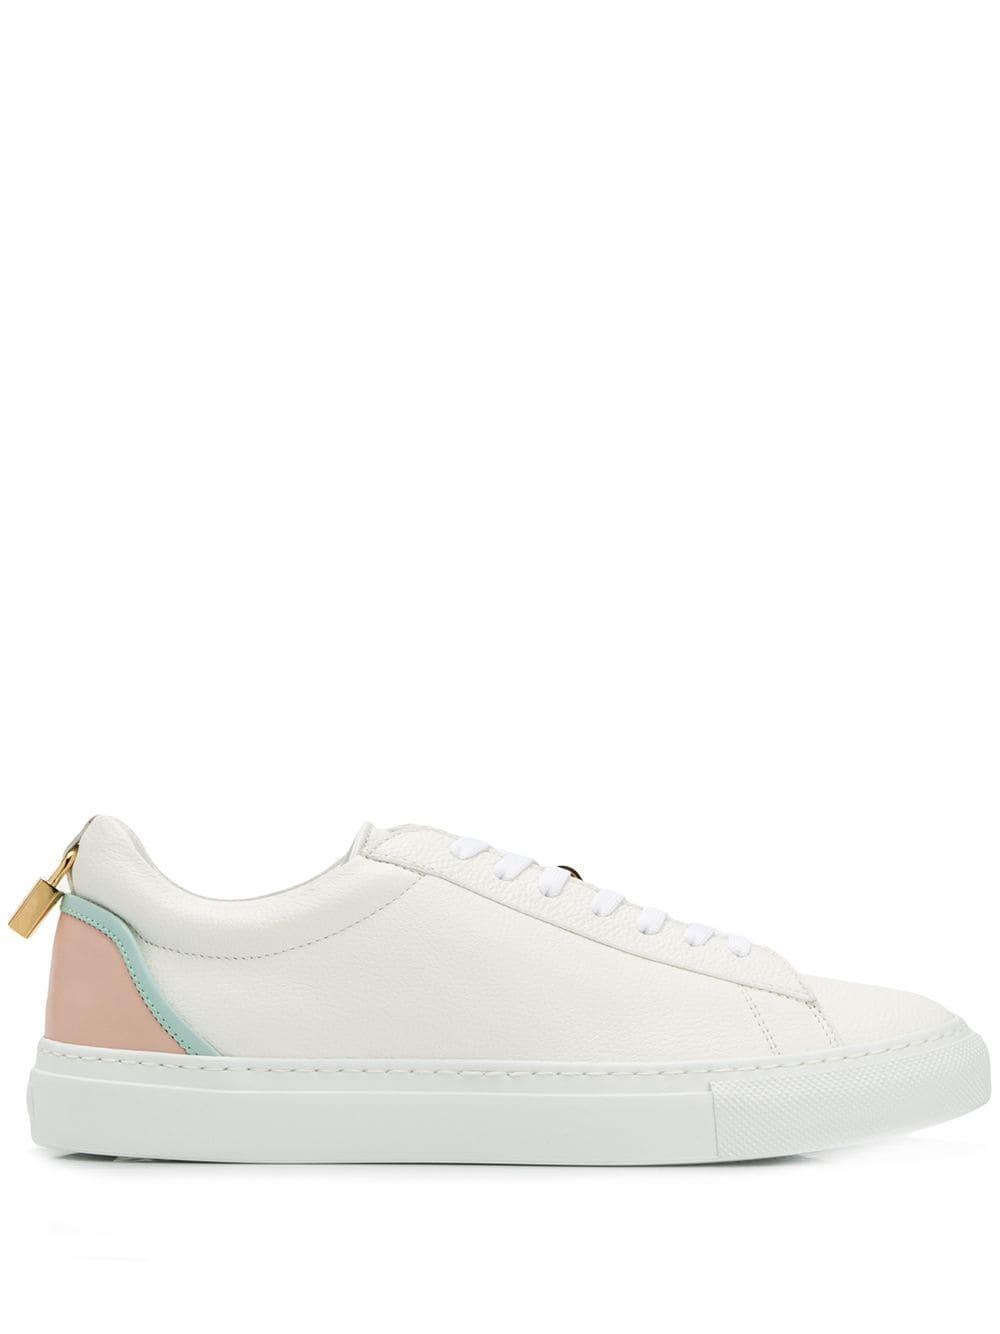 Buscemi Sneakers met contrasterende hak - Wit